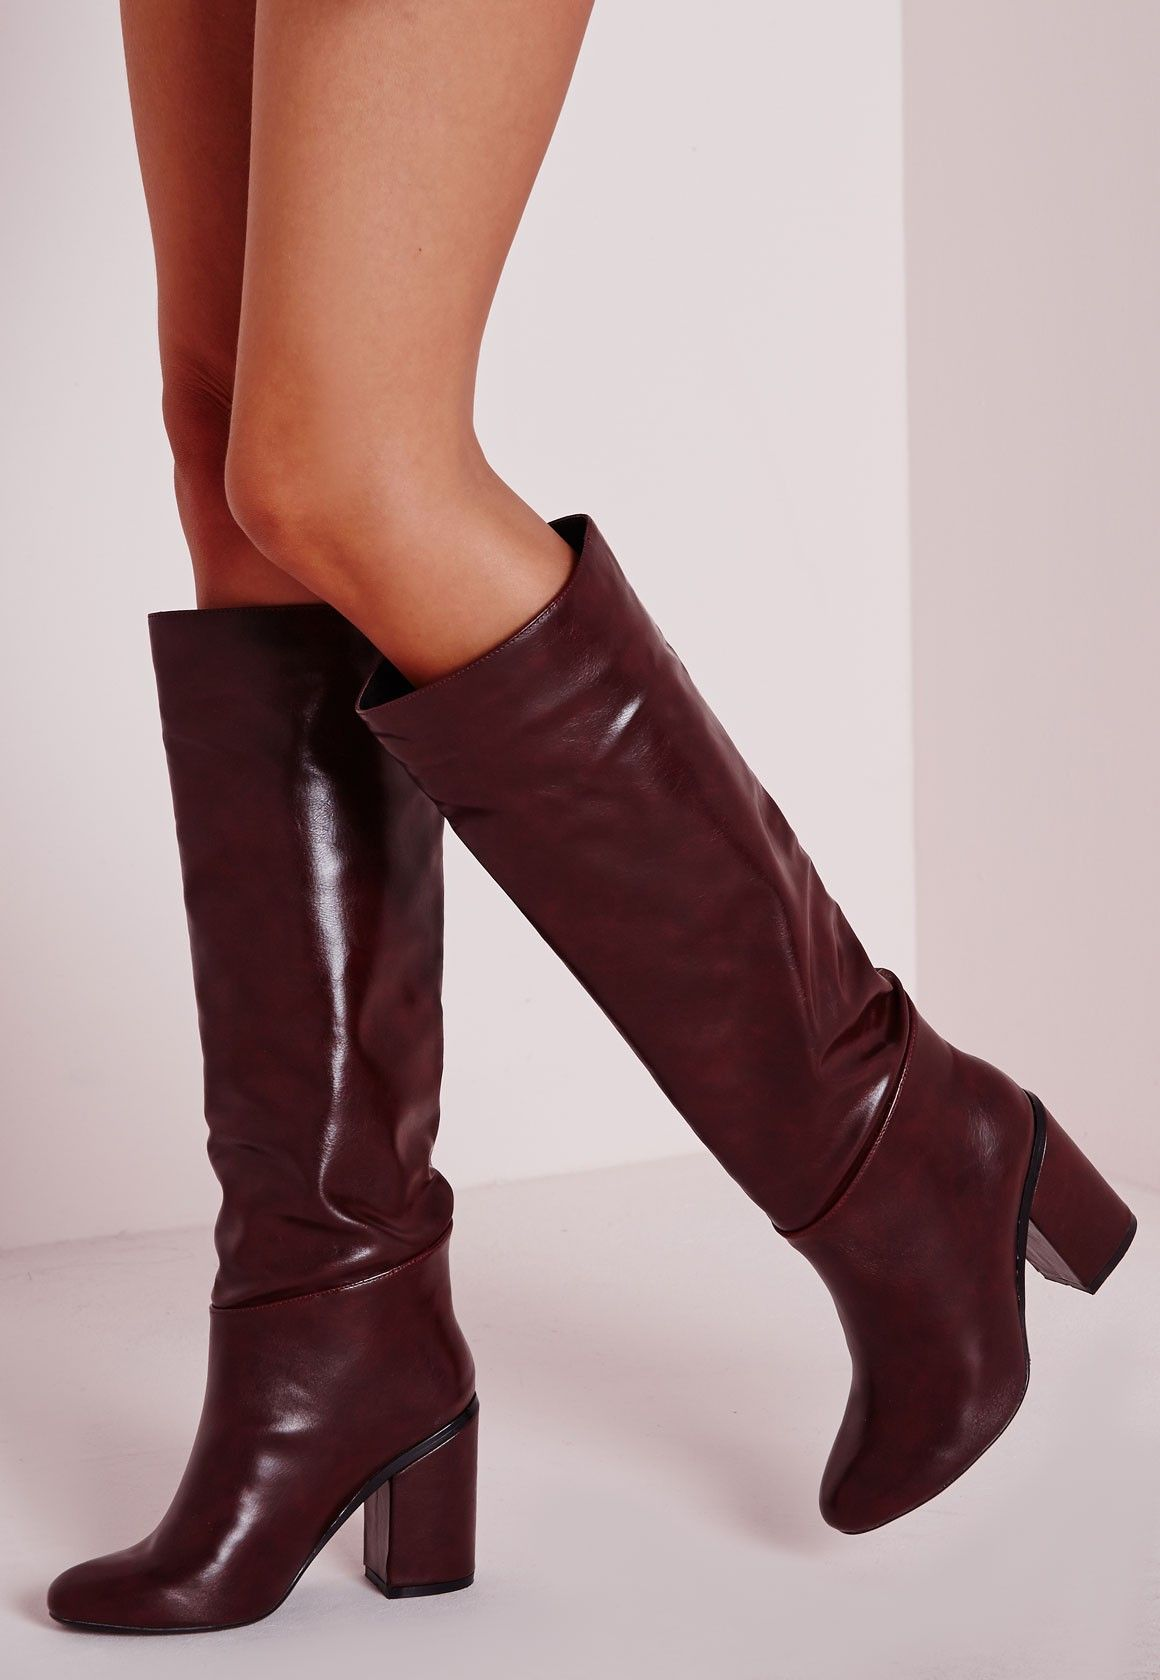 702474d572e Missguided - High Leg Patent Boots Burgundy 76.50